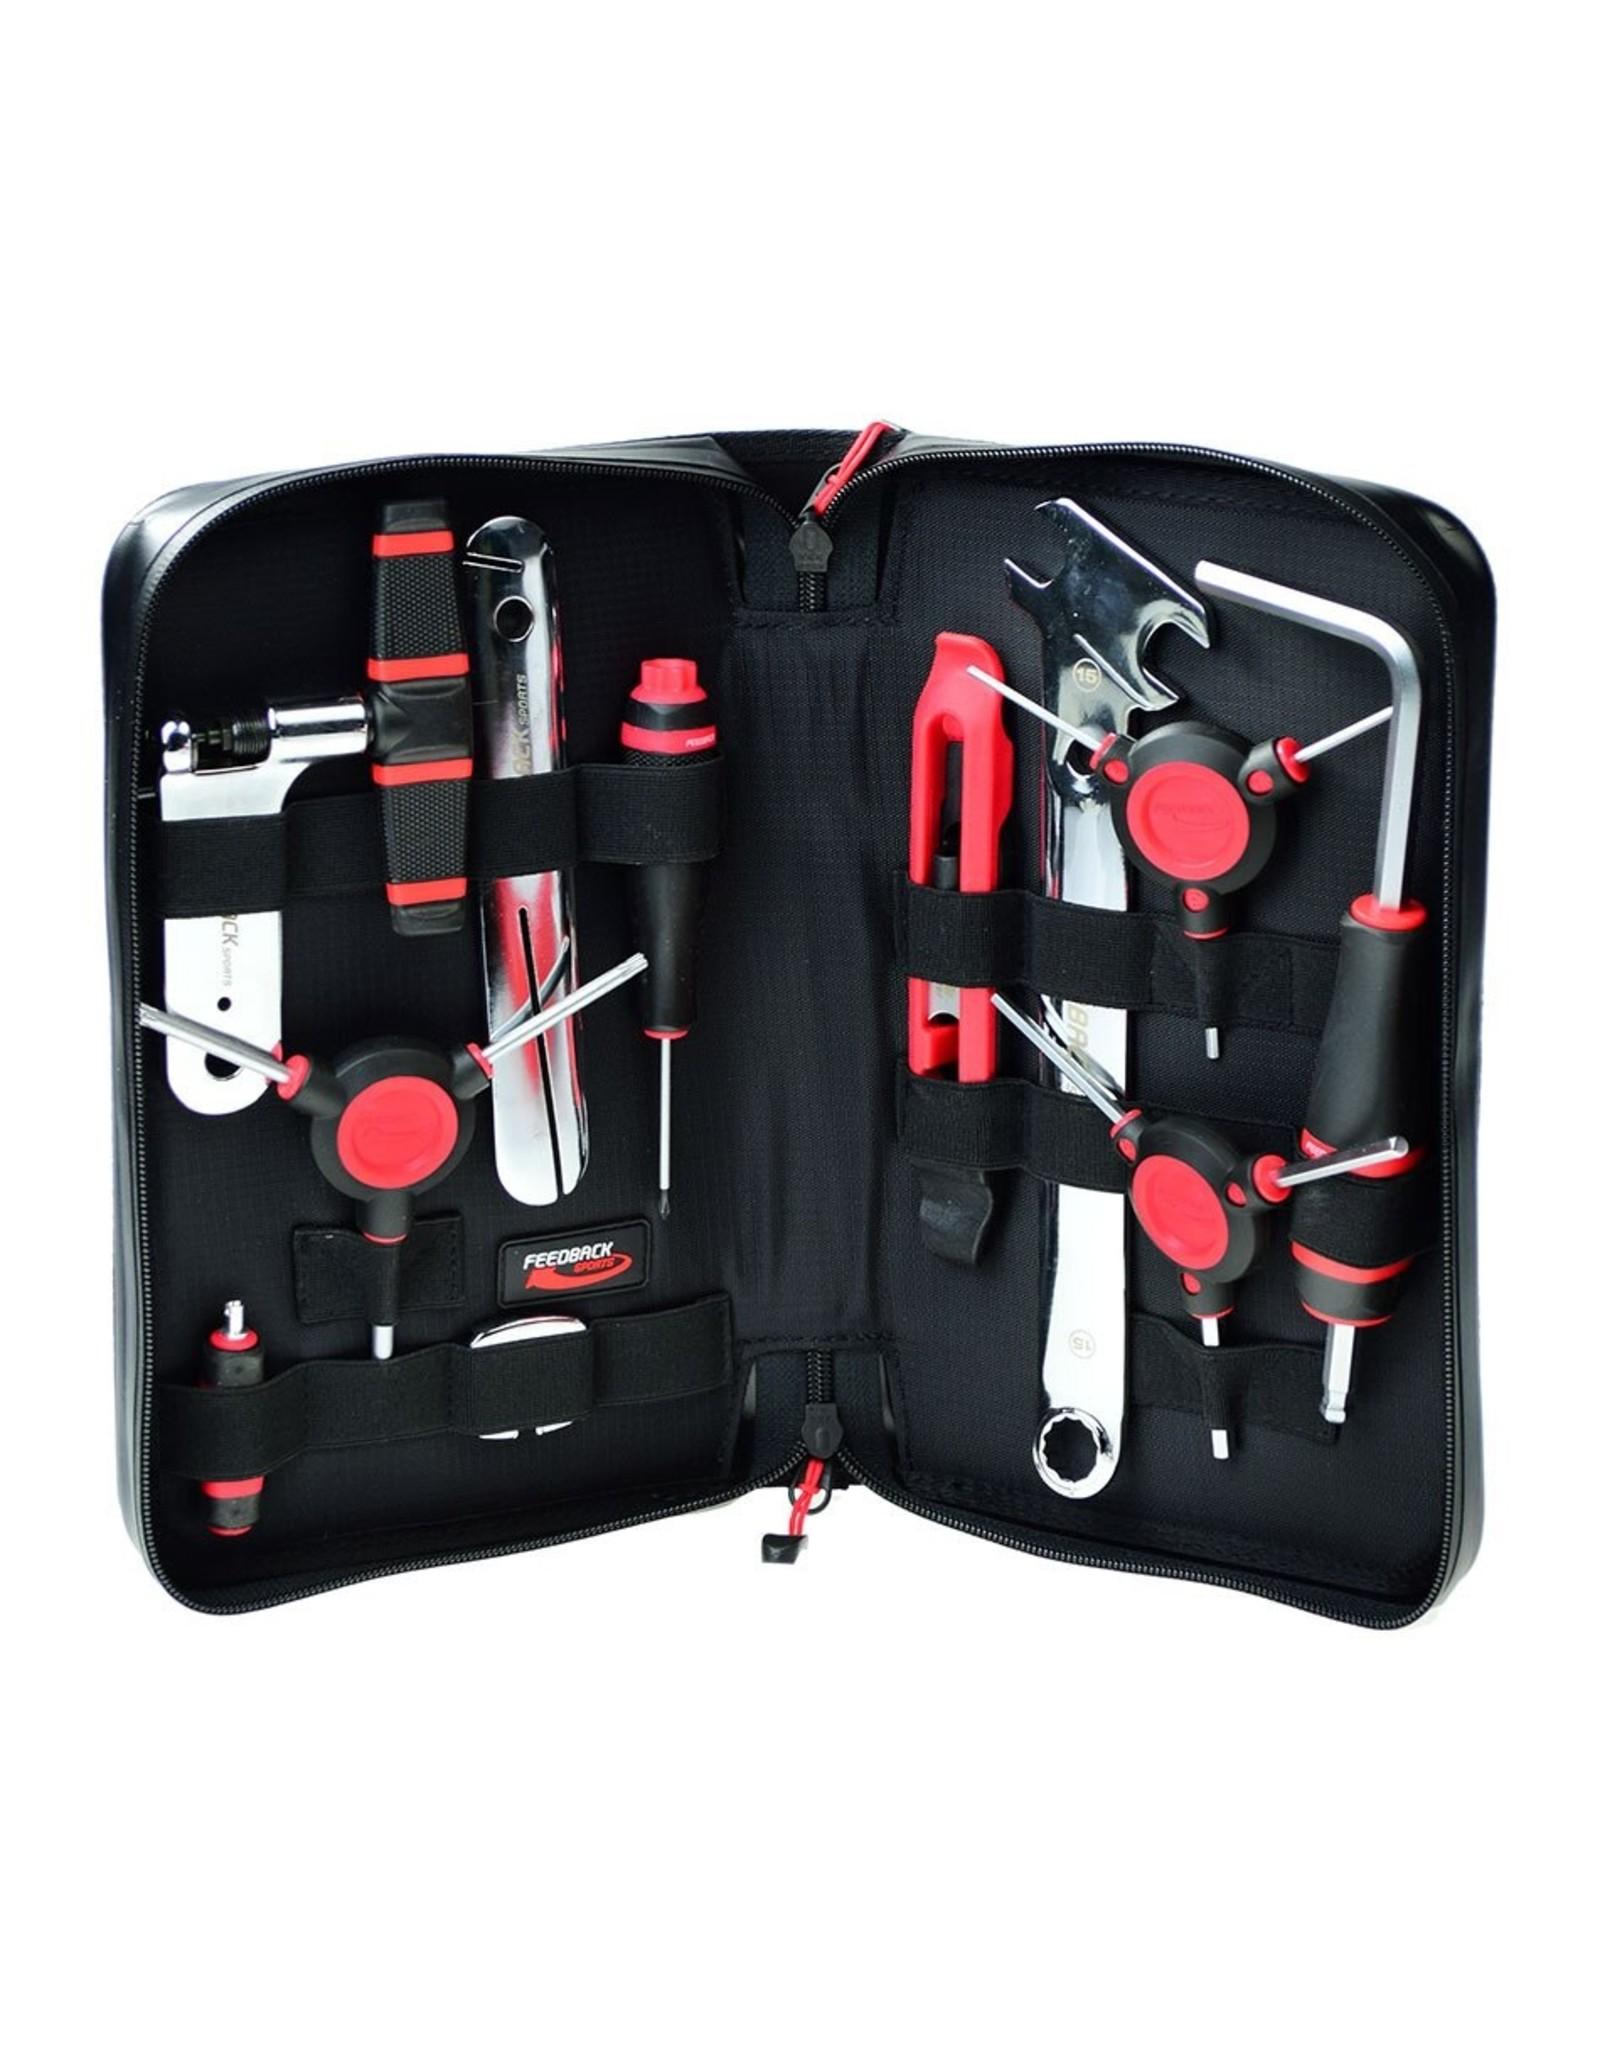 Feedback Sports Feedback Sports Ride Prep Tool Kit